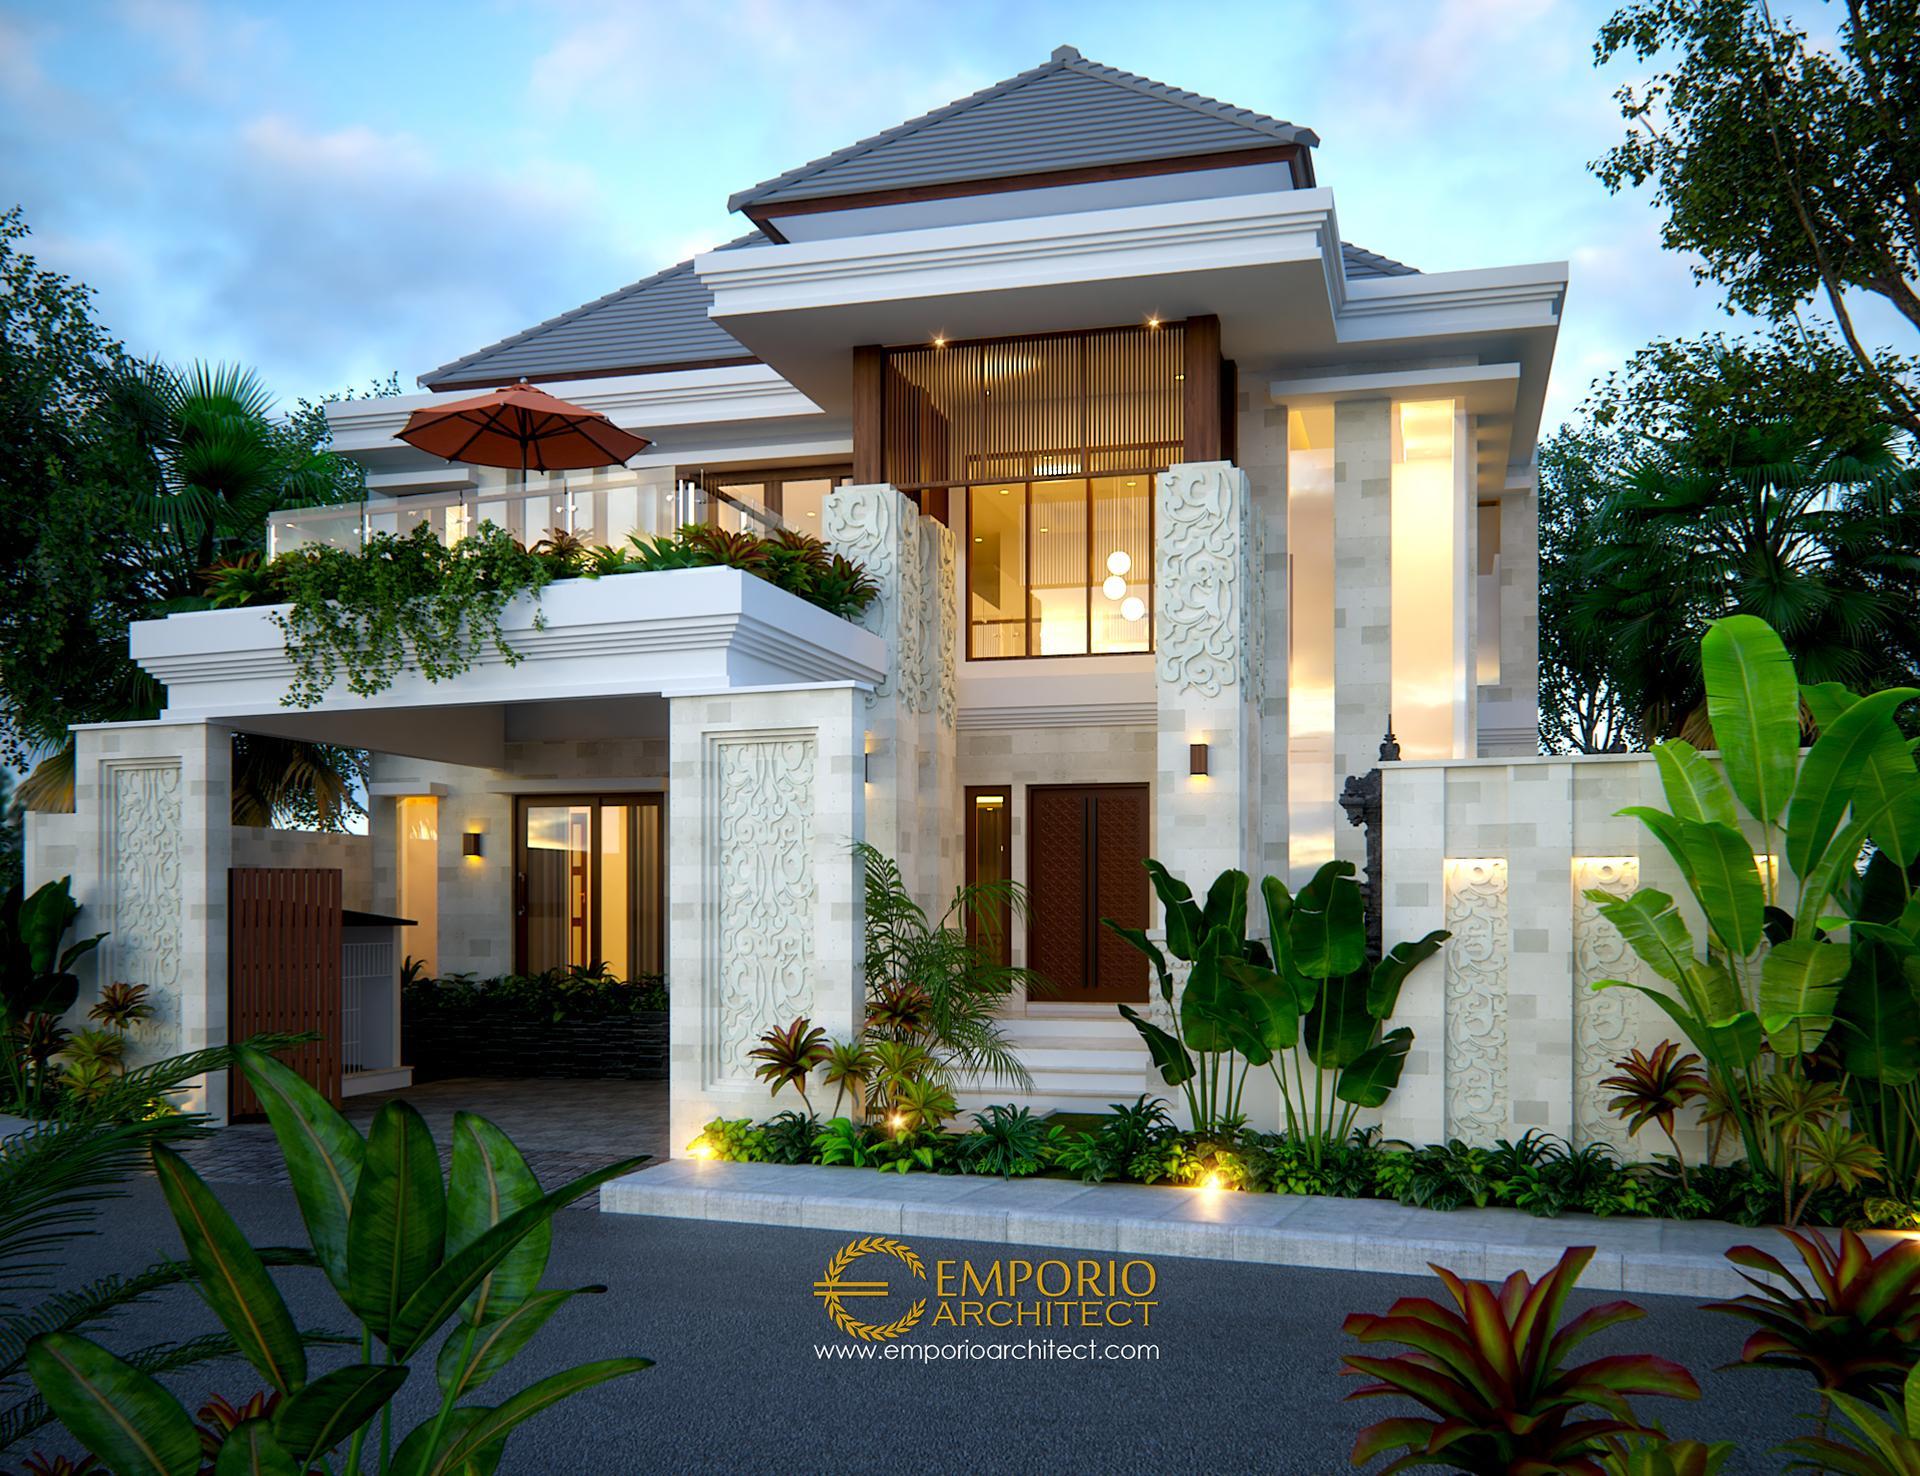 Mr. Rivan Villa Bali House 2 Floors Design - Nusa Dua, Bali